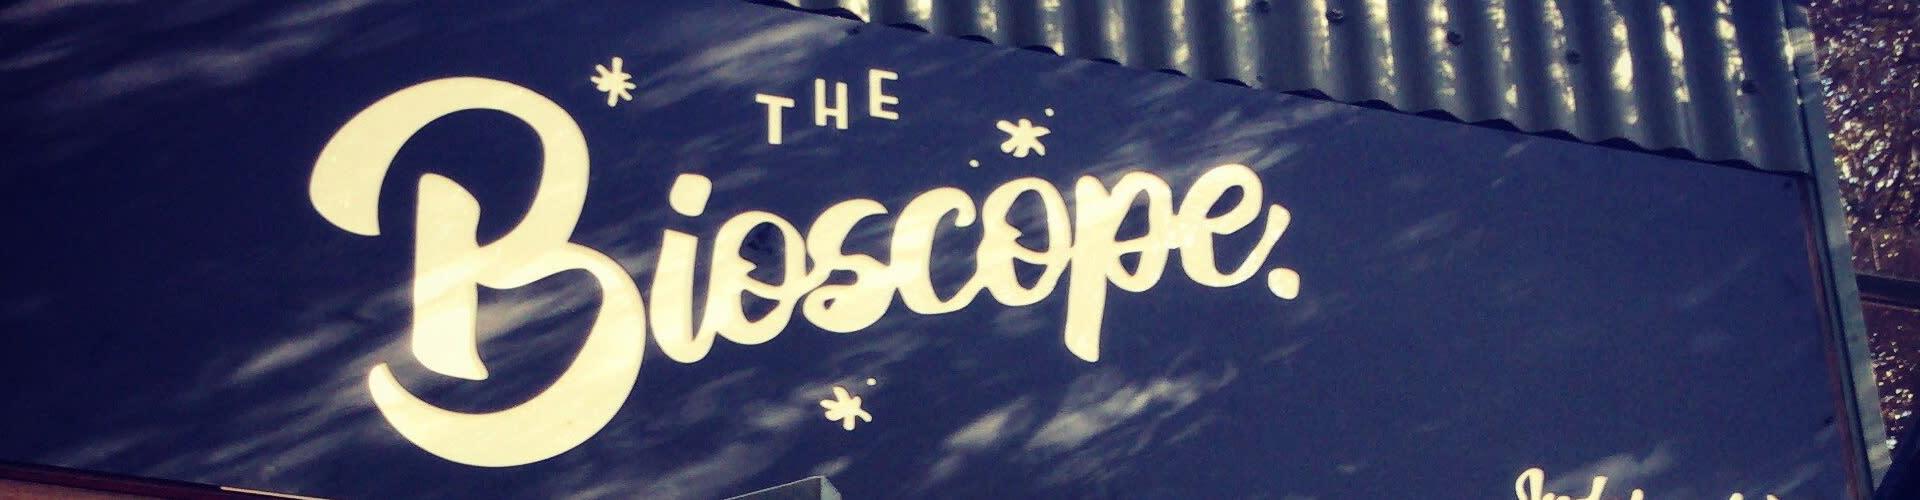 THE BIOSCOPE